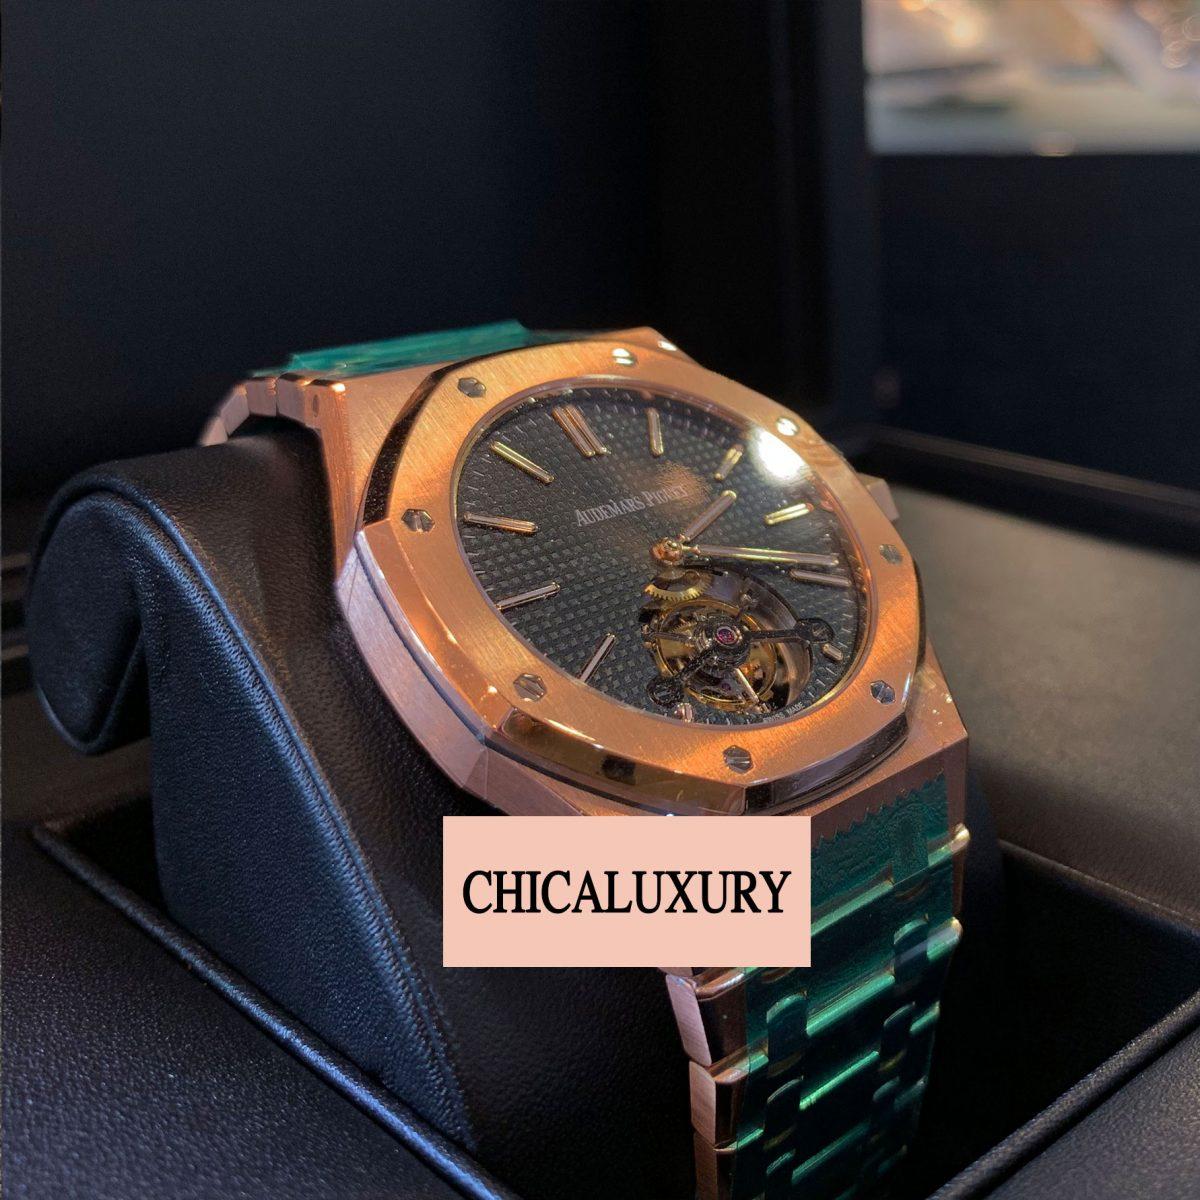 audemars-piguet-royal-oak-tourbillon-extra-thin-pink-gold-26510or-oo-1220or-01-6